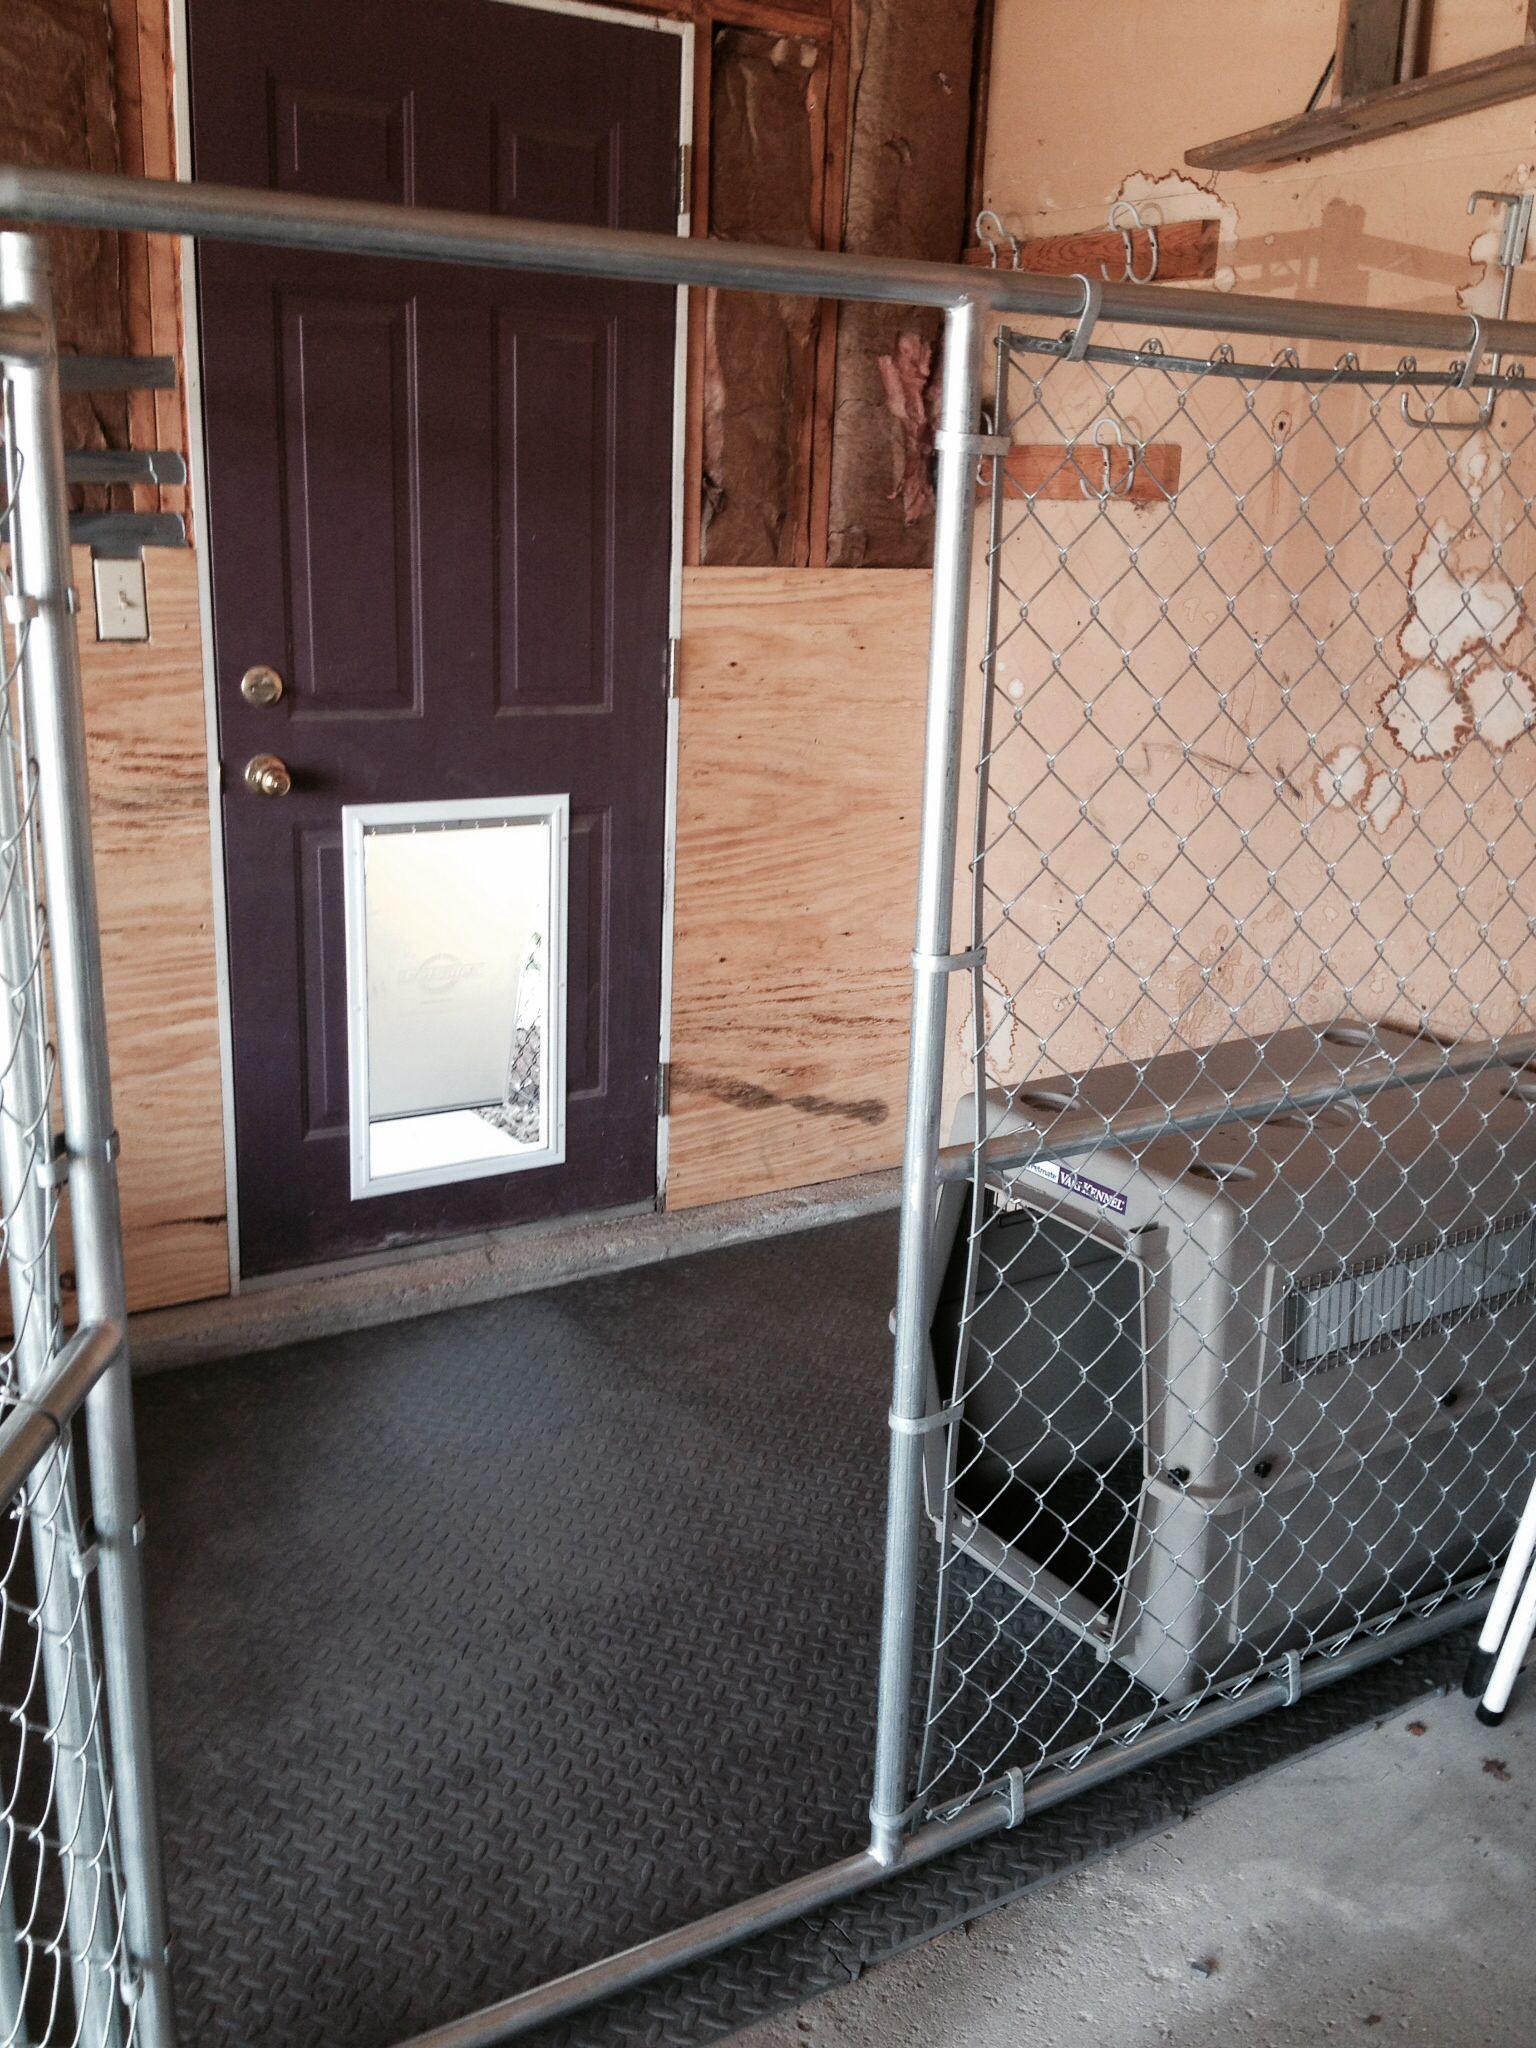 Indoor dog kennel Home Ideas Pinterest